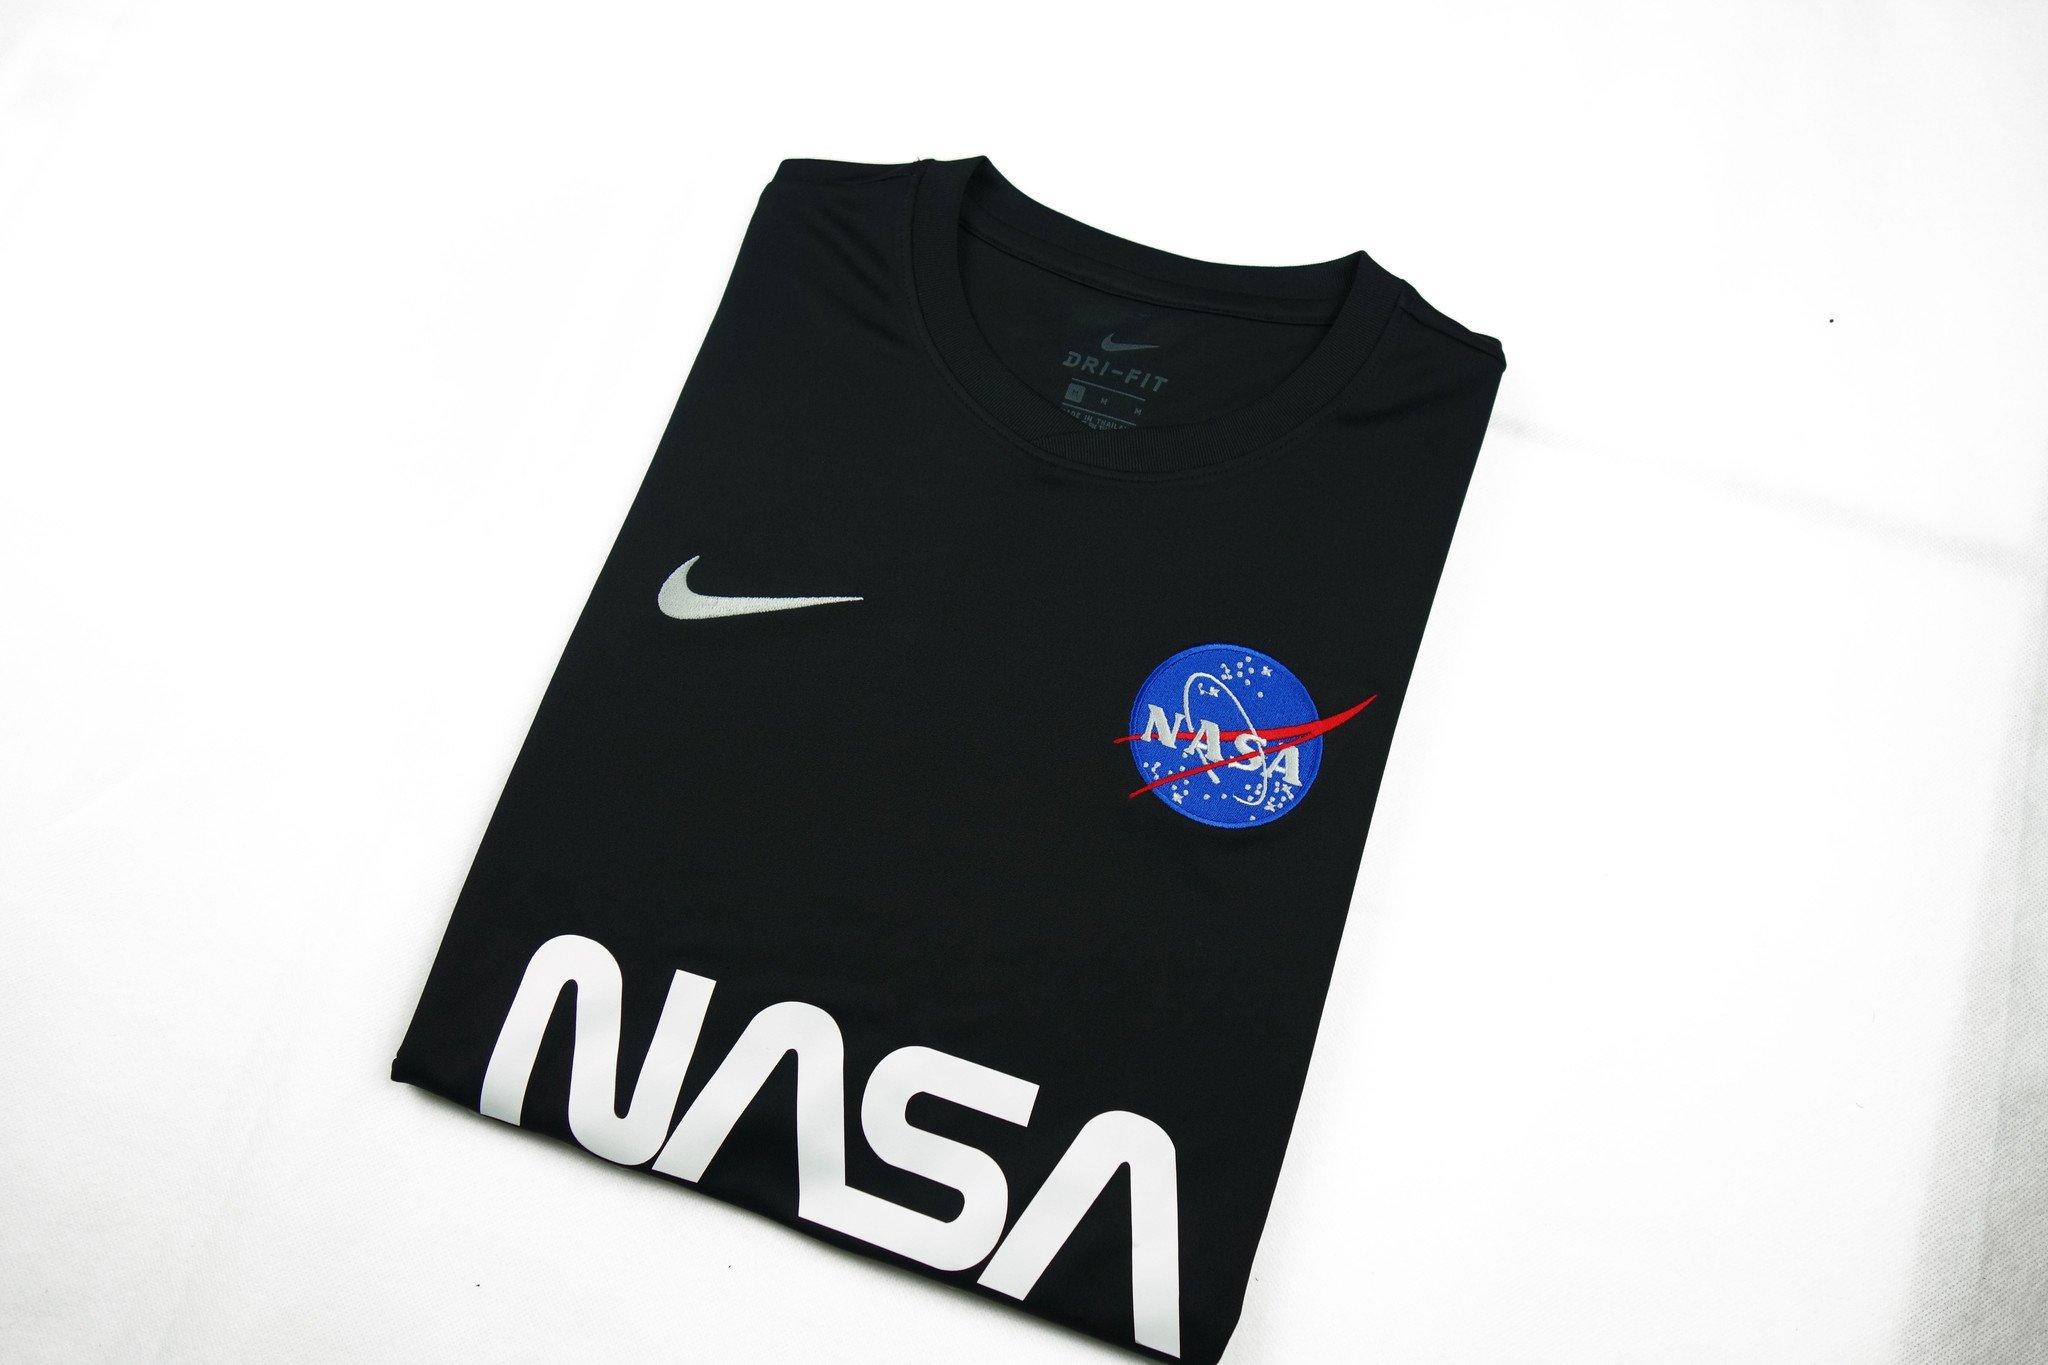 Nike_NASA_Shirt_02